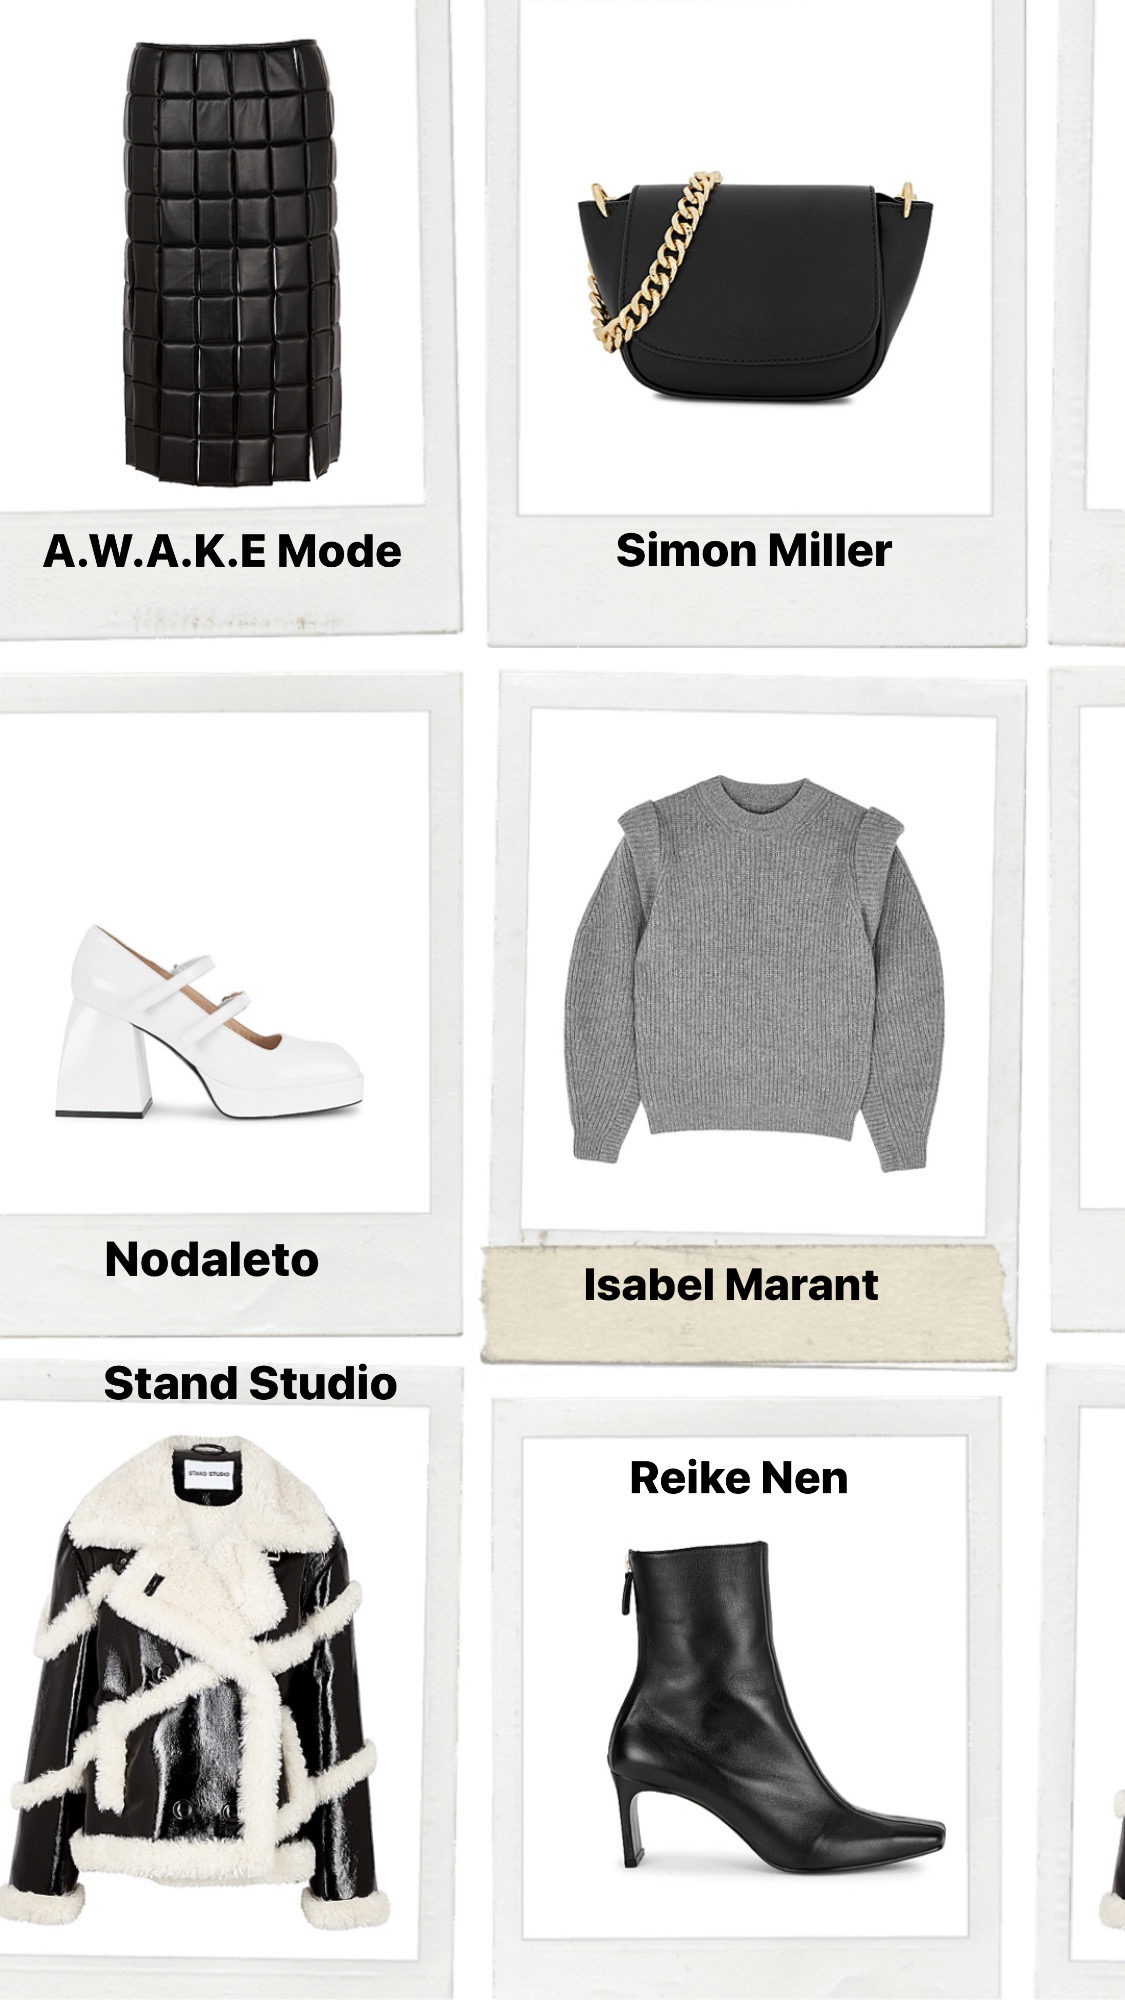 cyber week designers sale up to 40 percent off at Harvey Nichols: awake mode nanushka jaquemus paco rabanne aquazurra saint laurent balmain nodaleto isabel marant